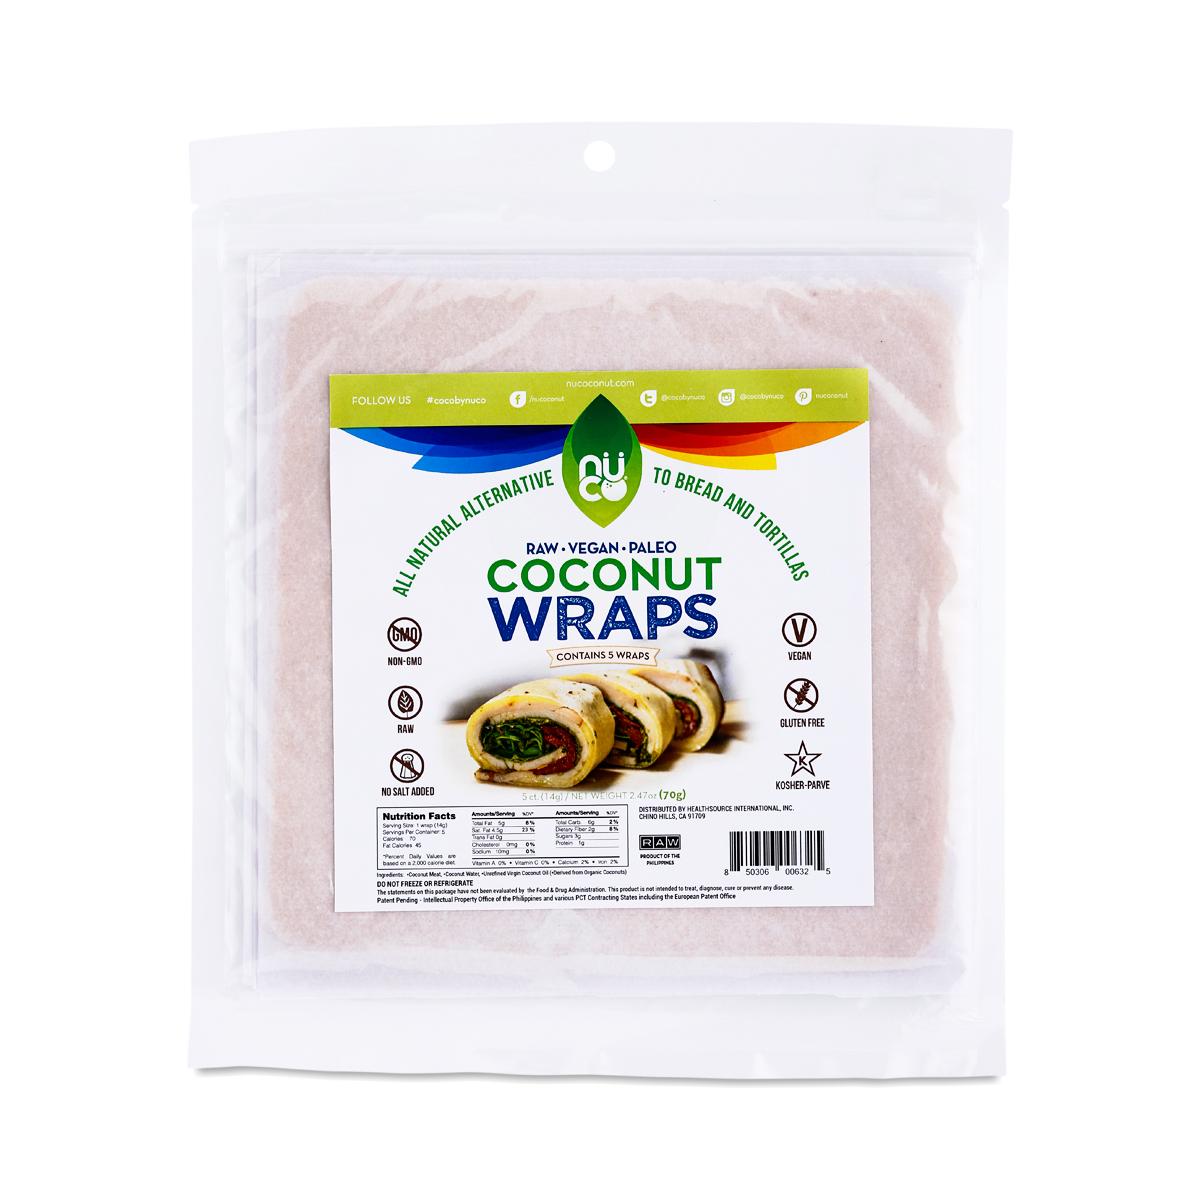 Nuco Original Coconut Wraps five 14g wraps